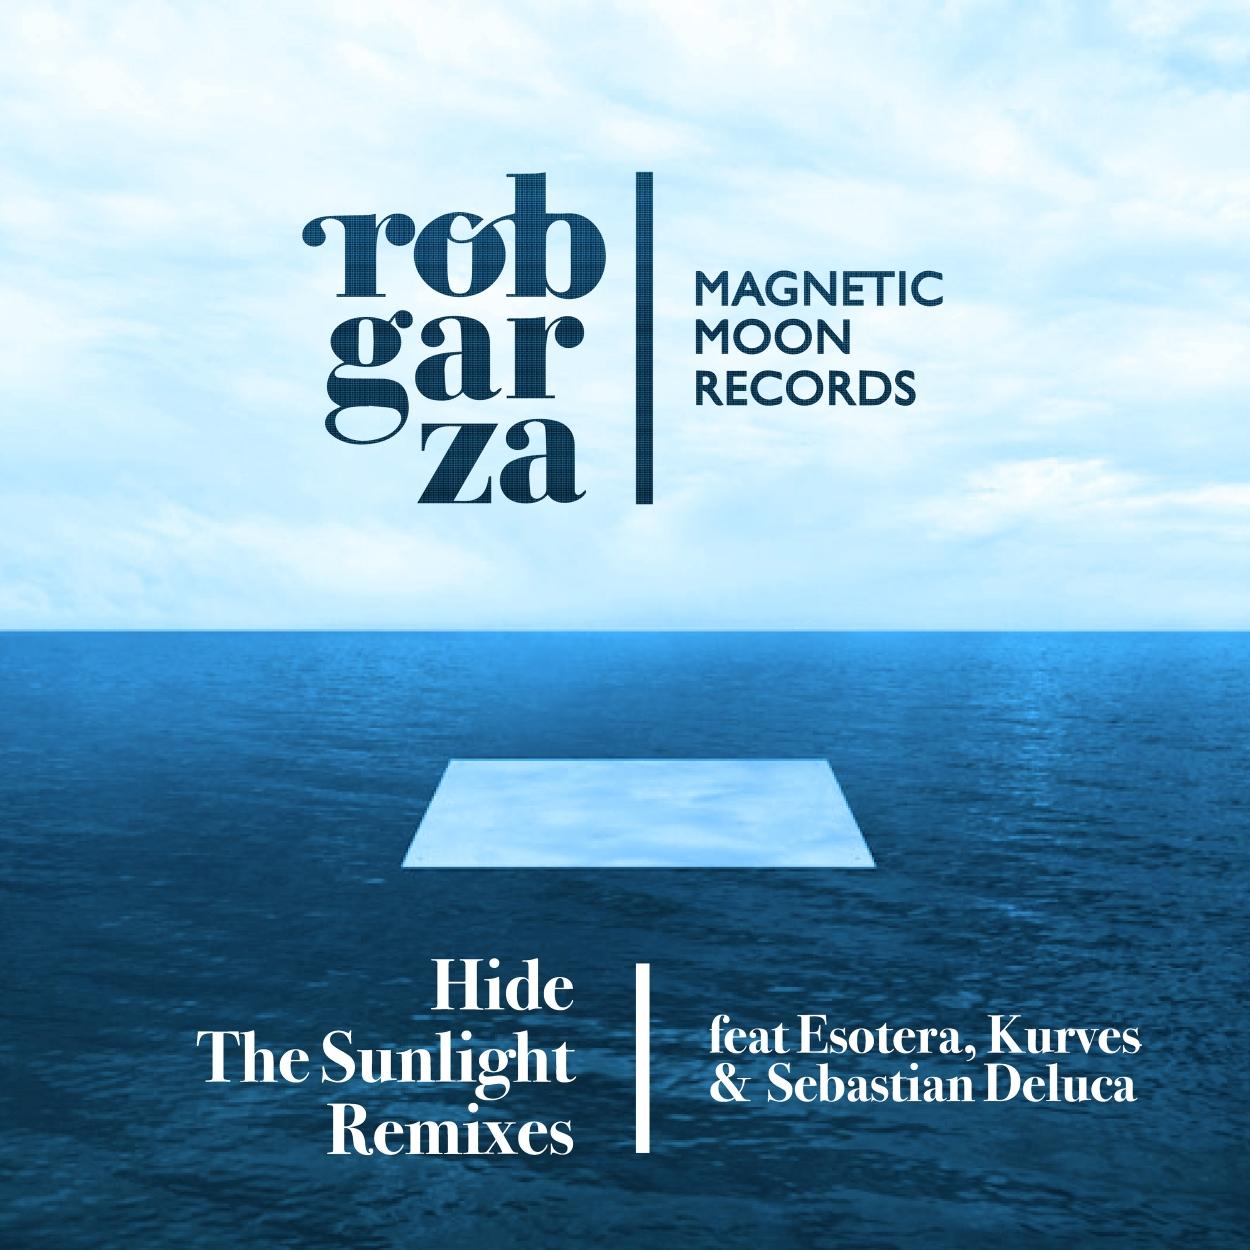 Rob Garza - Hide The Sunlight Remixes Cover Art